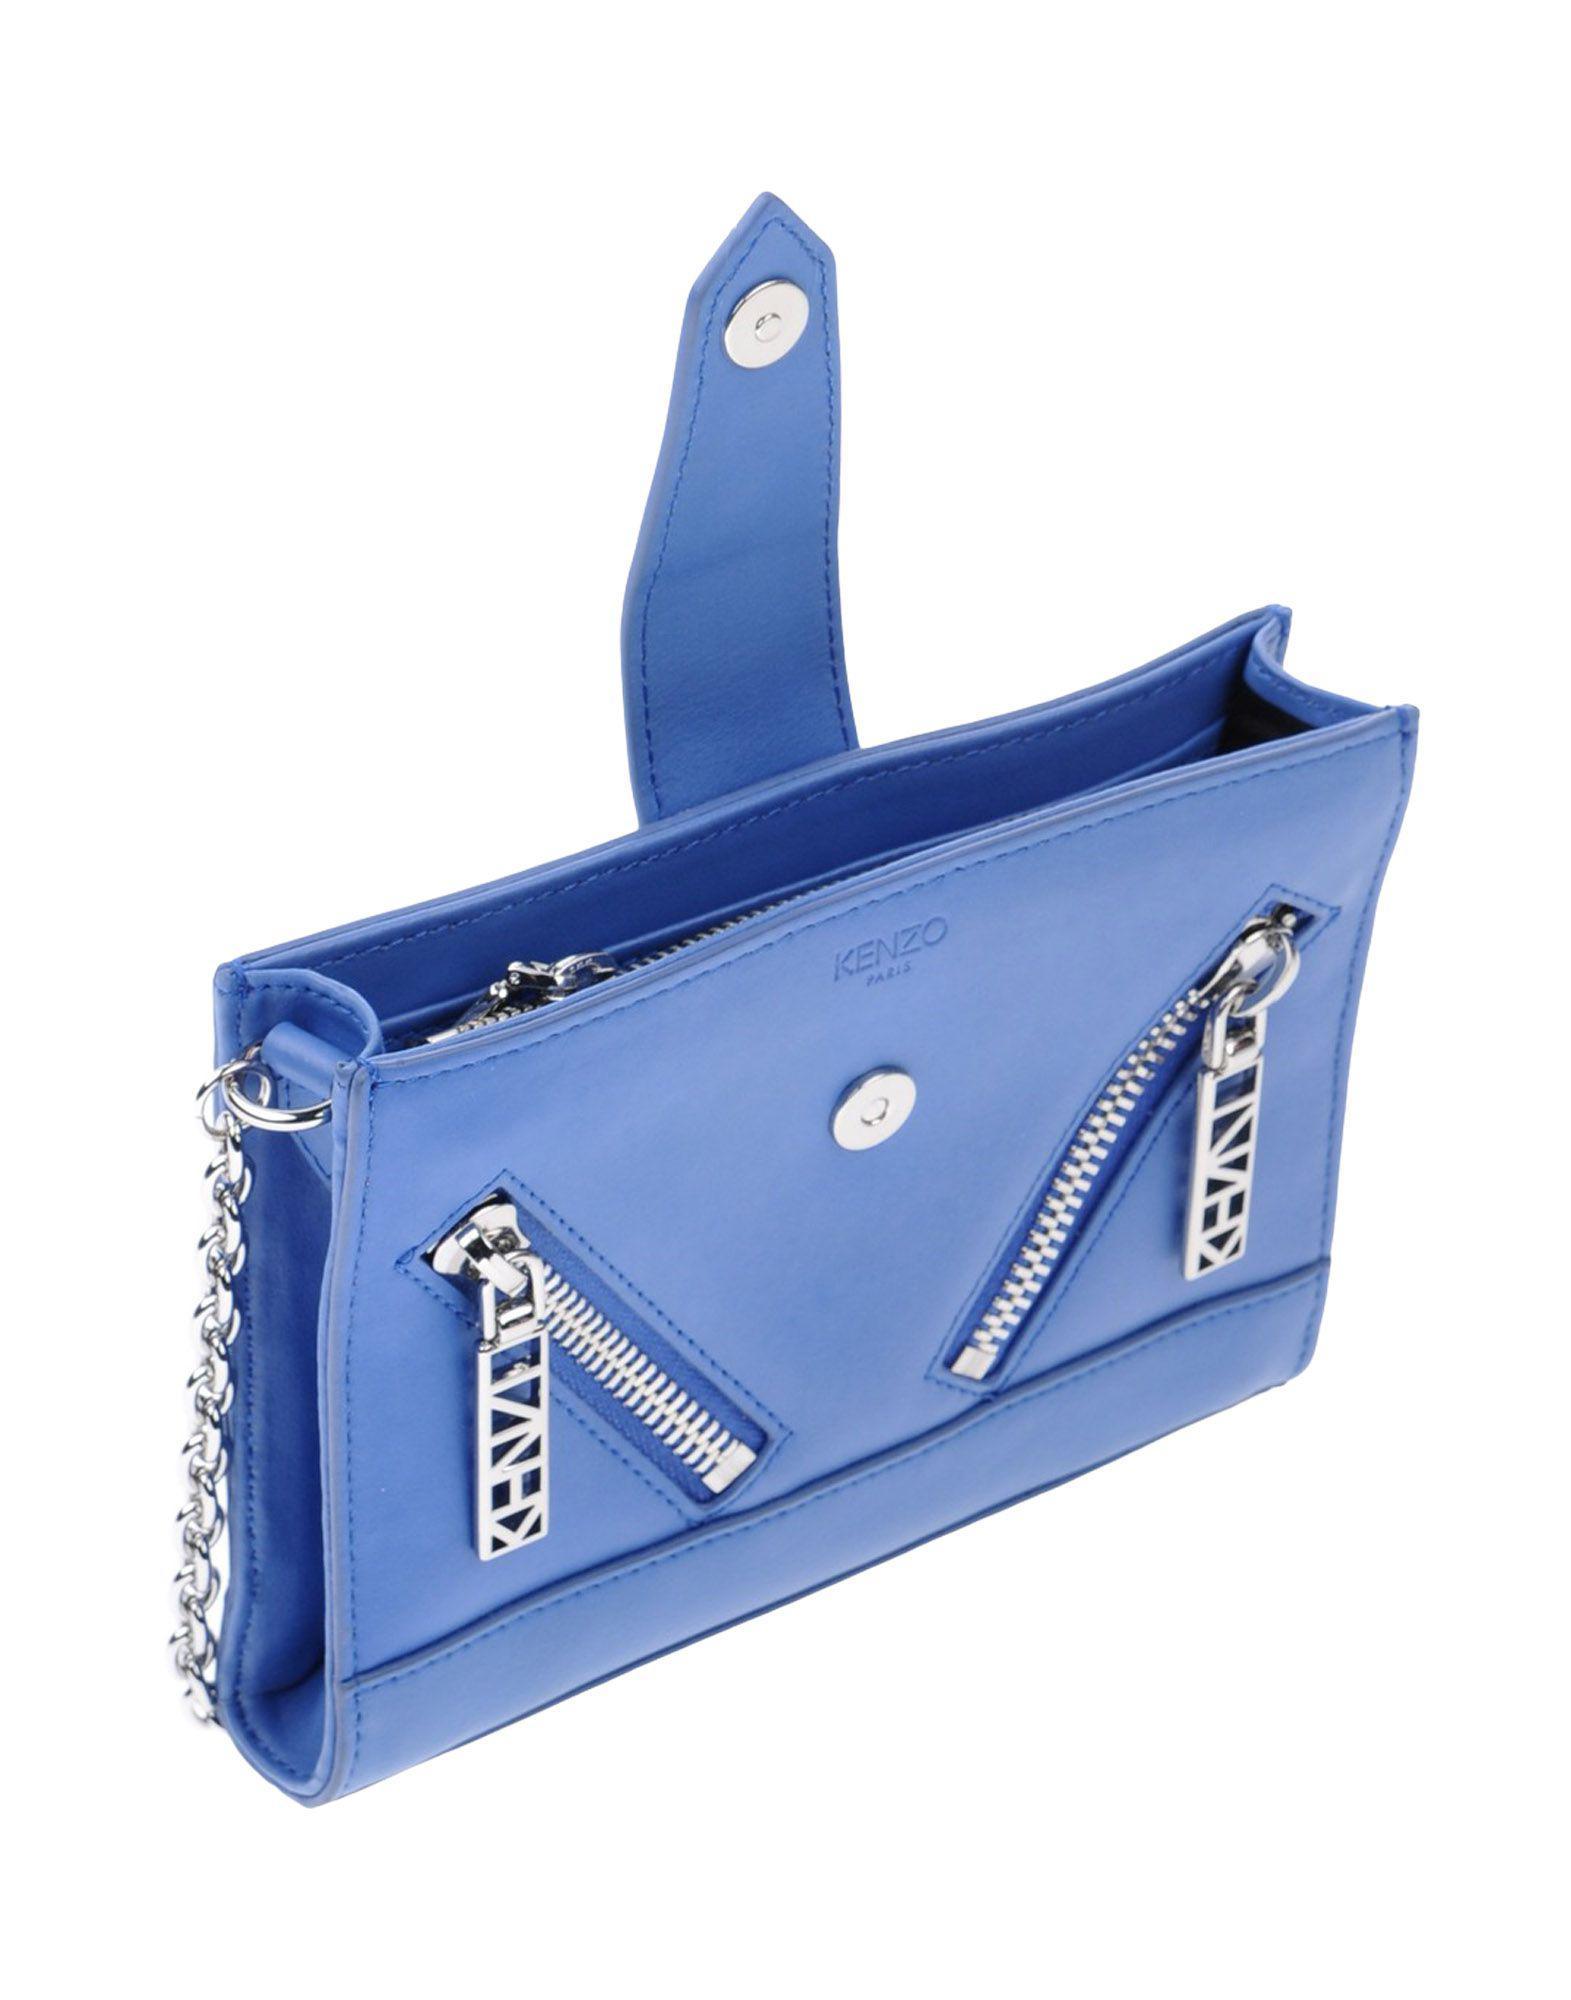 KENZO Leather Cross-body Bag in Pastel Blue (Blue)